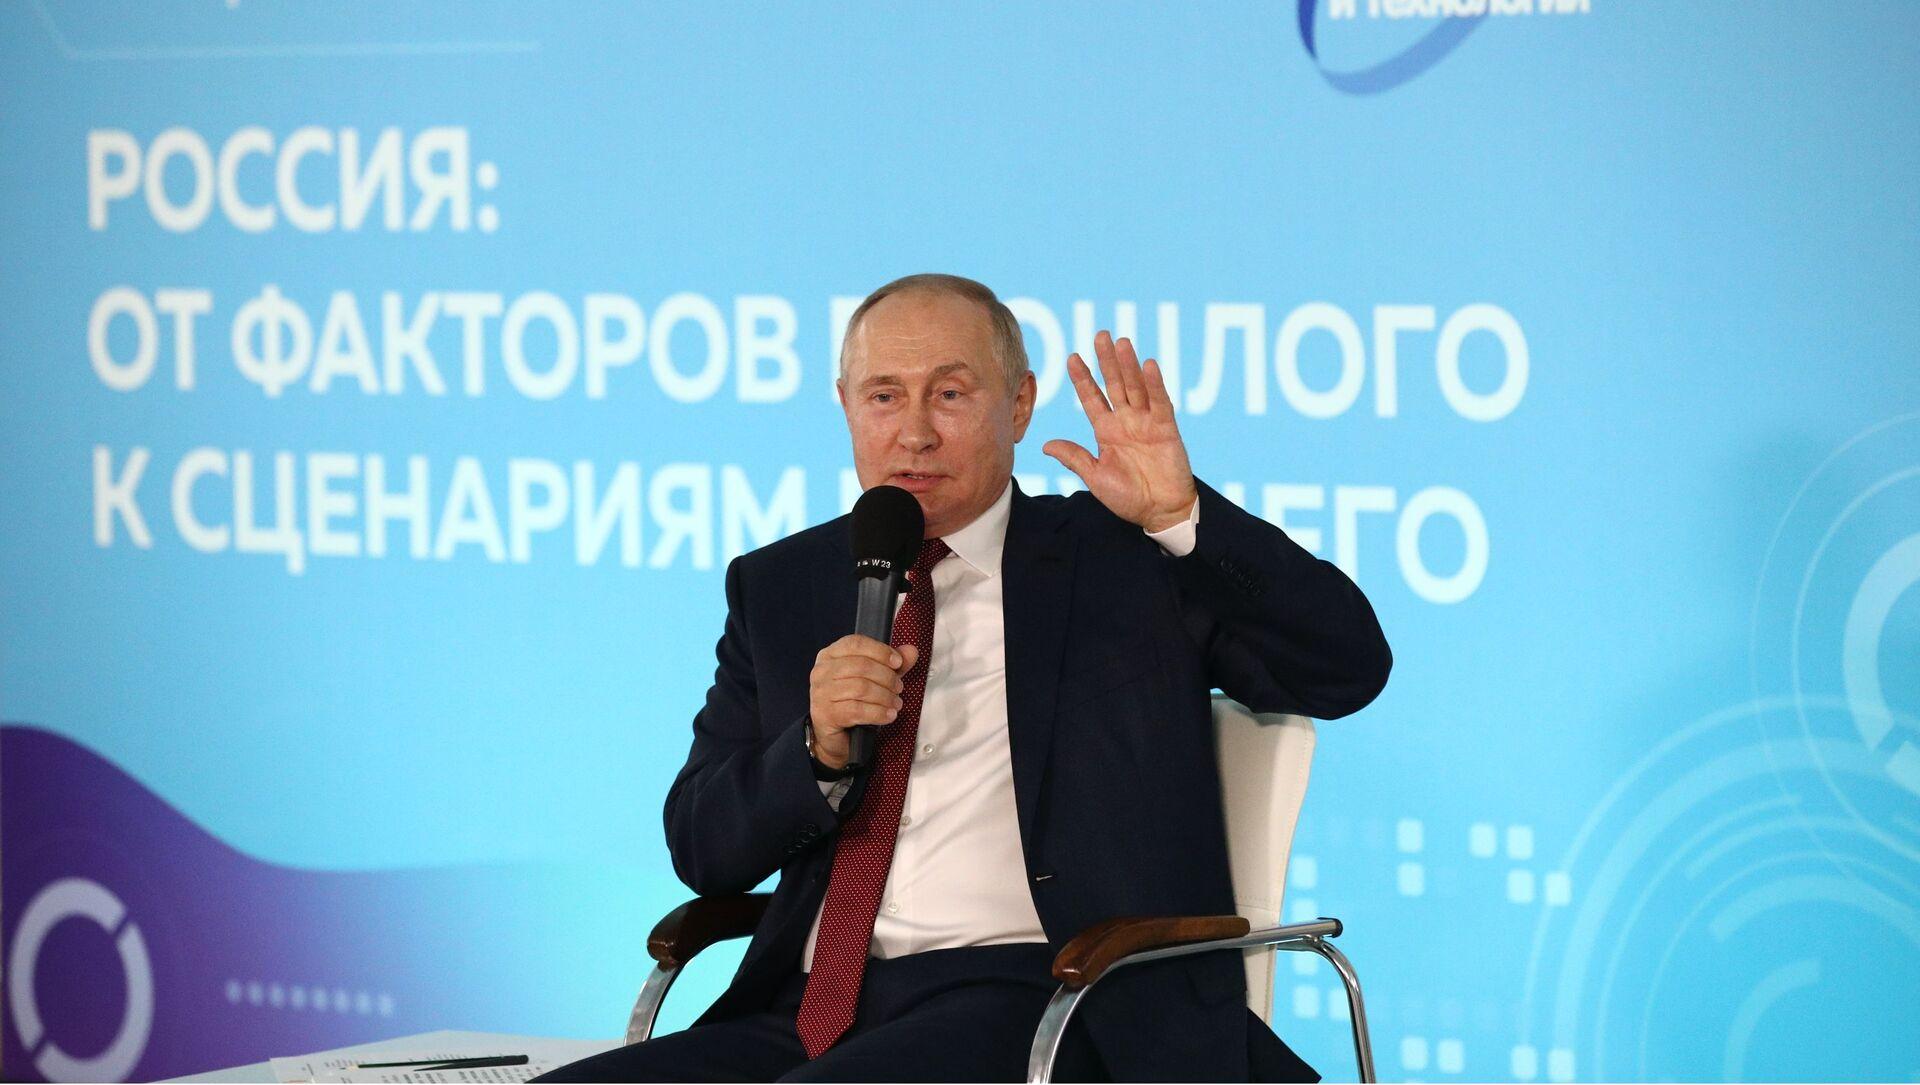 Президент РФ В. Путин провел встречу со школьниками - Sputnik Абхазия, 1920, 01.09.2021